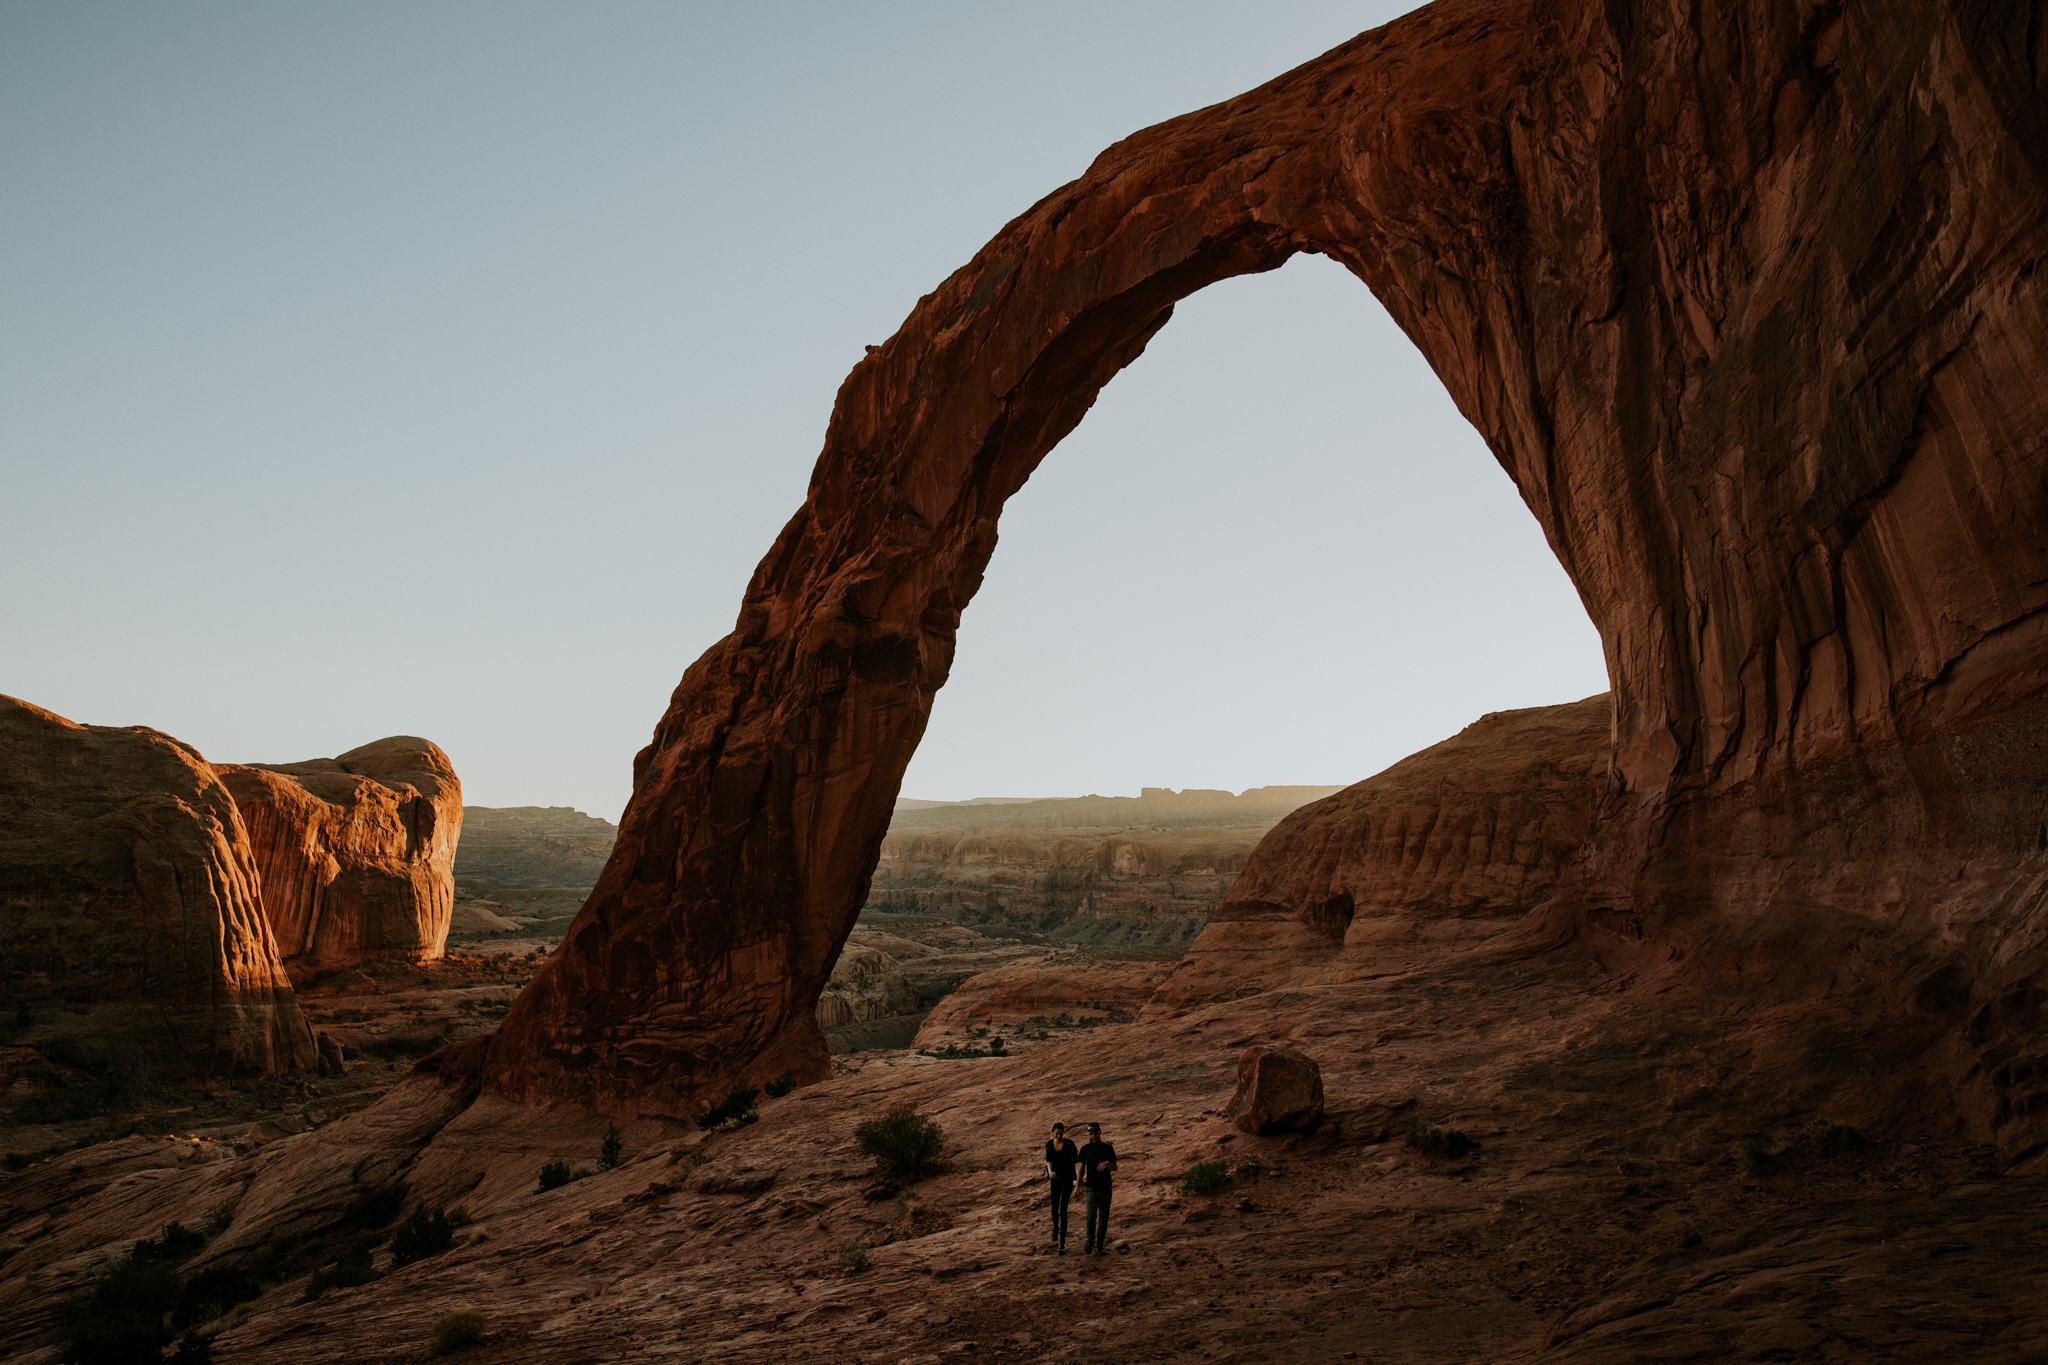 Corona Arch Sunset - Moab Elopement Photographer - Moab Elopement Videographer - Vow of the Wild